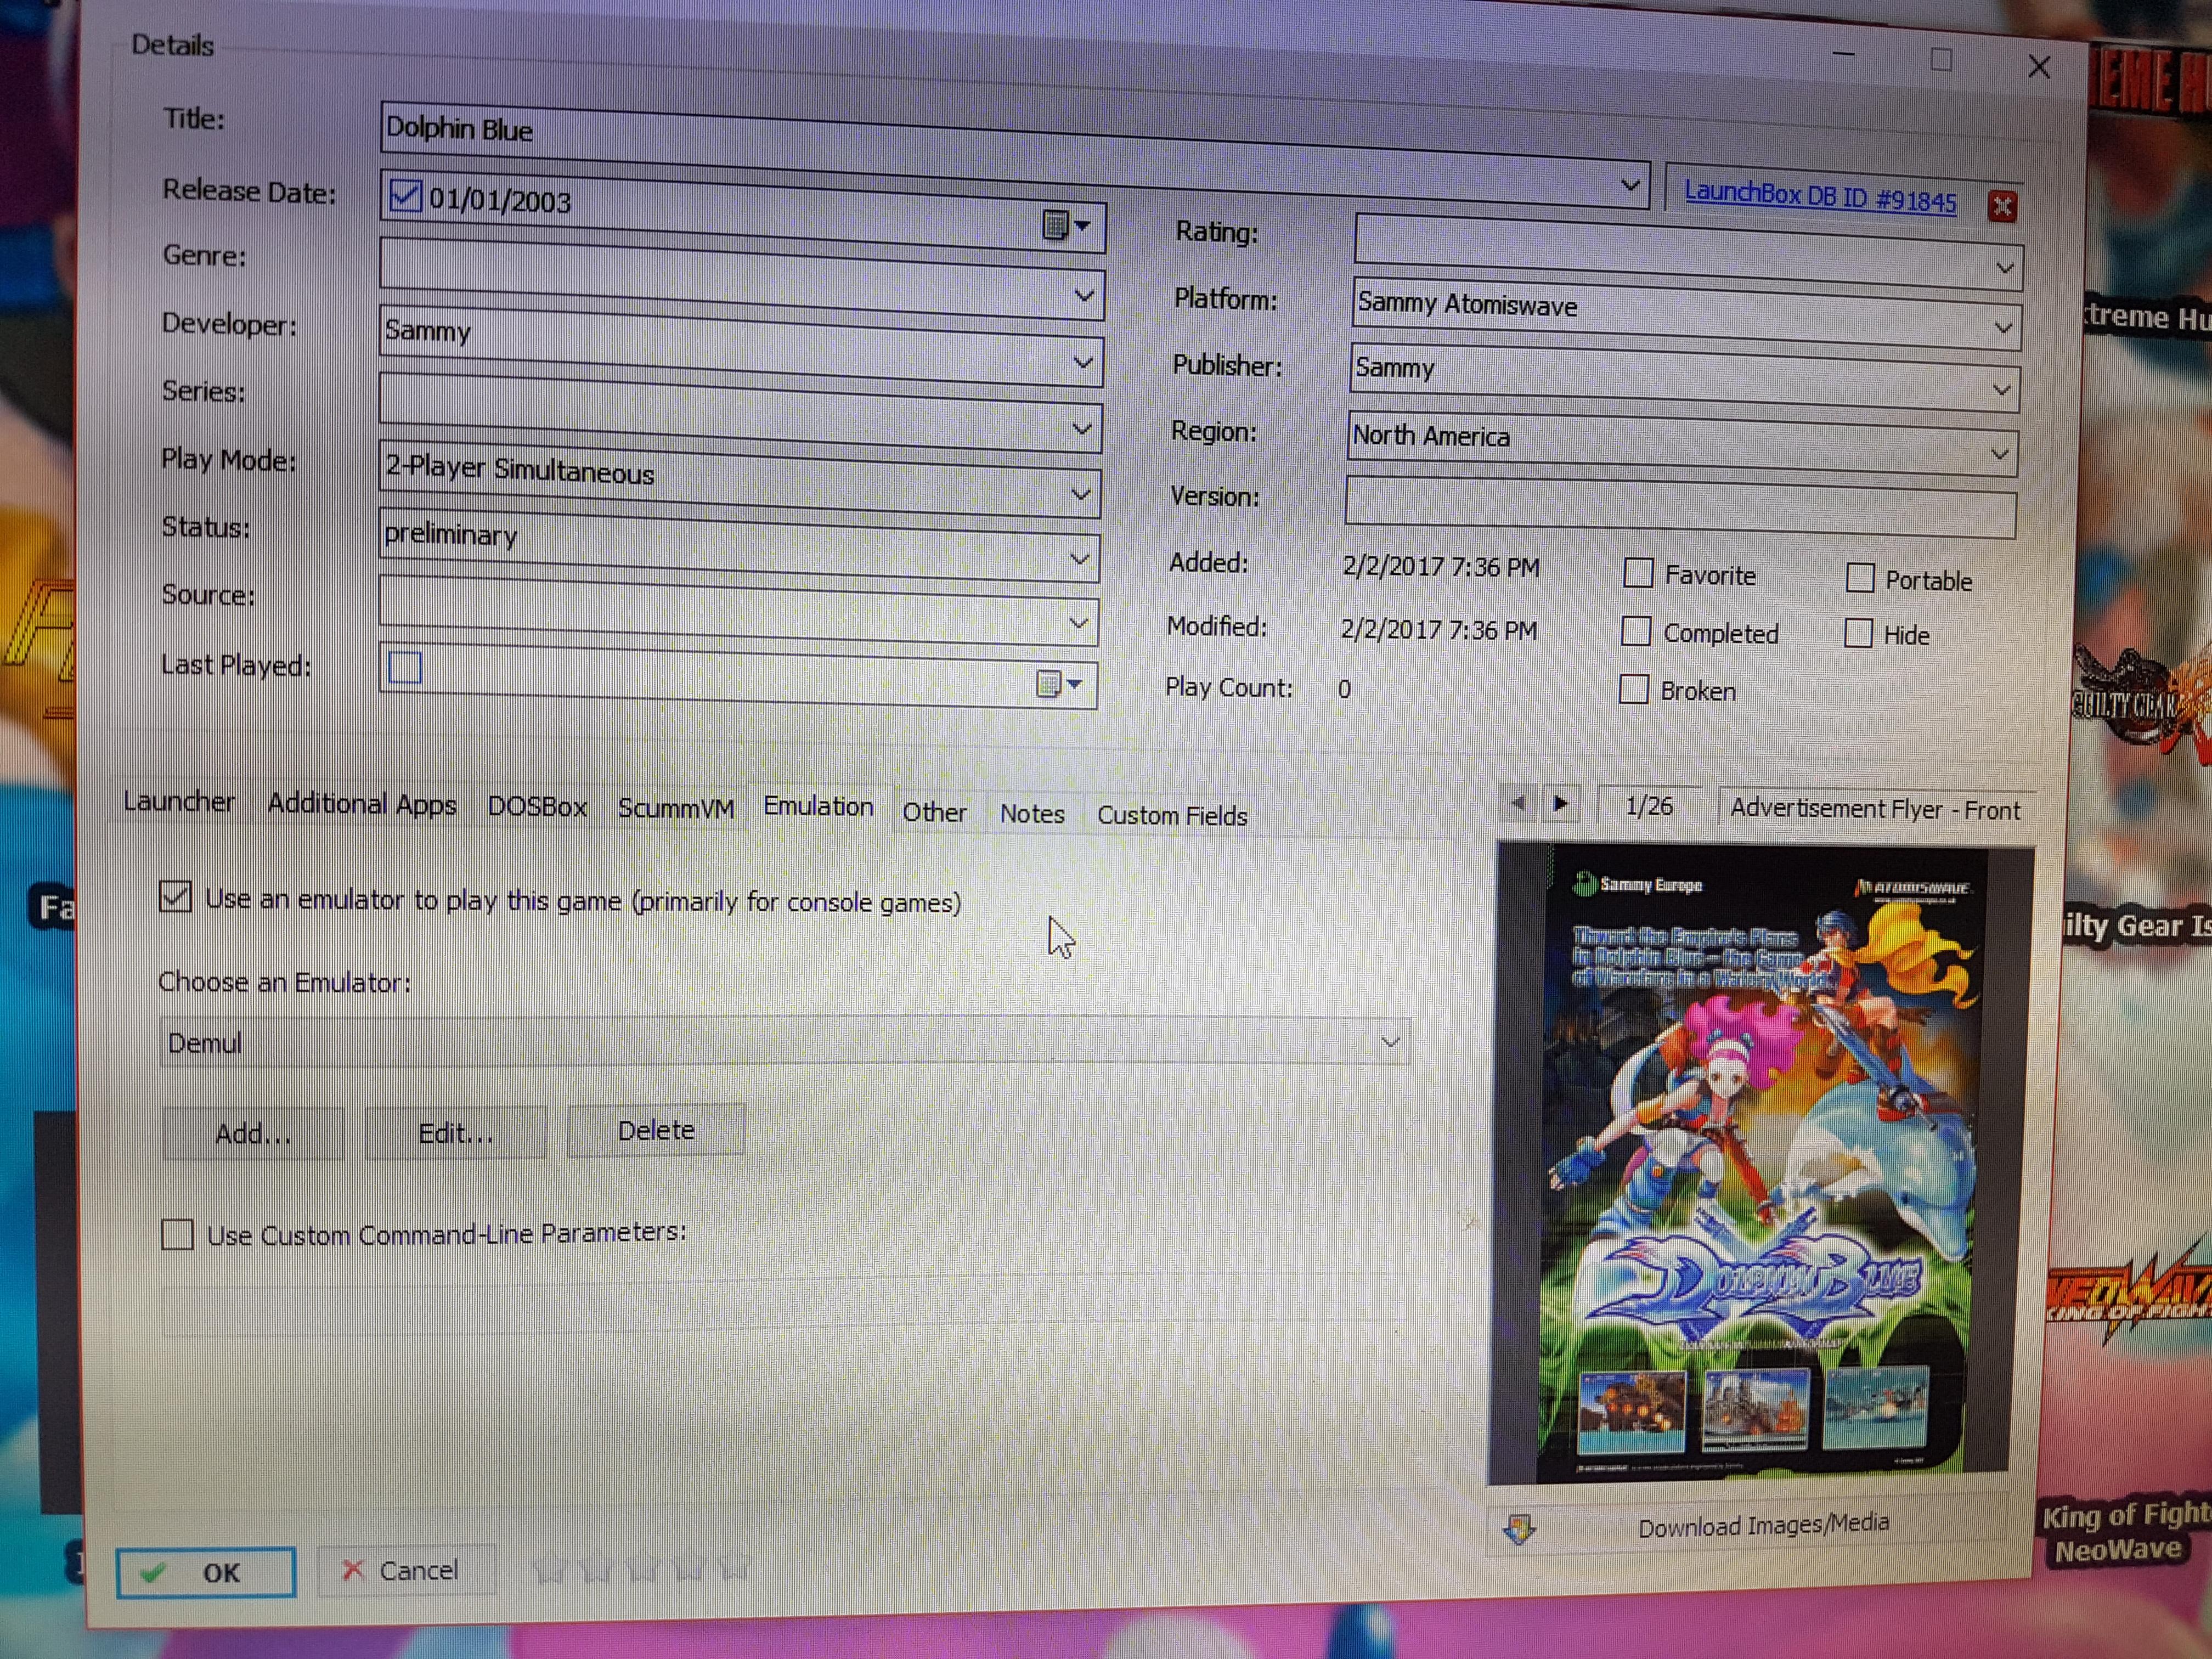 Sega Naomi (Demul) in LaunchBox - Page 4 - Emulation